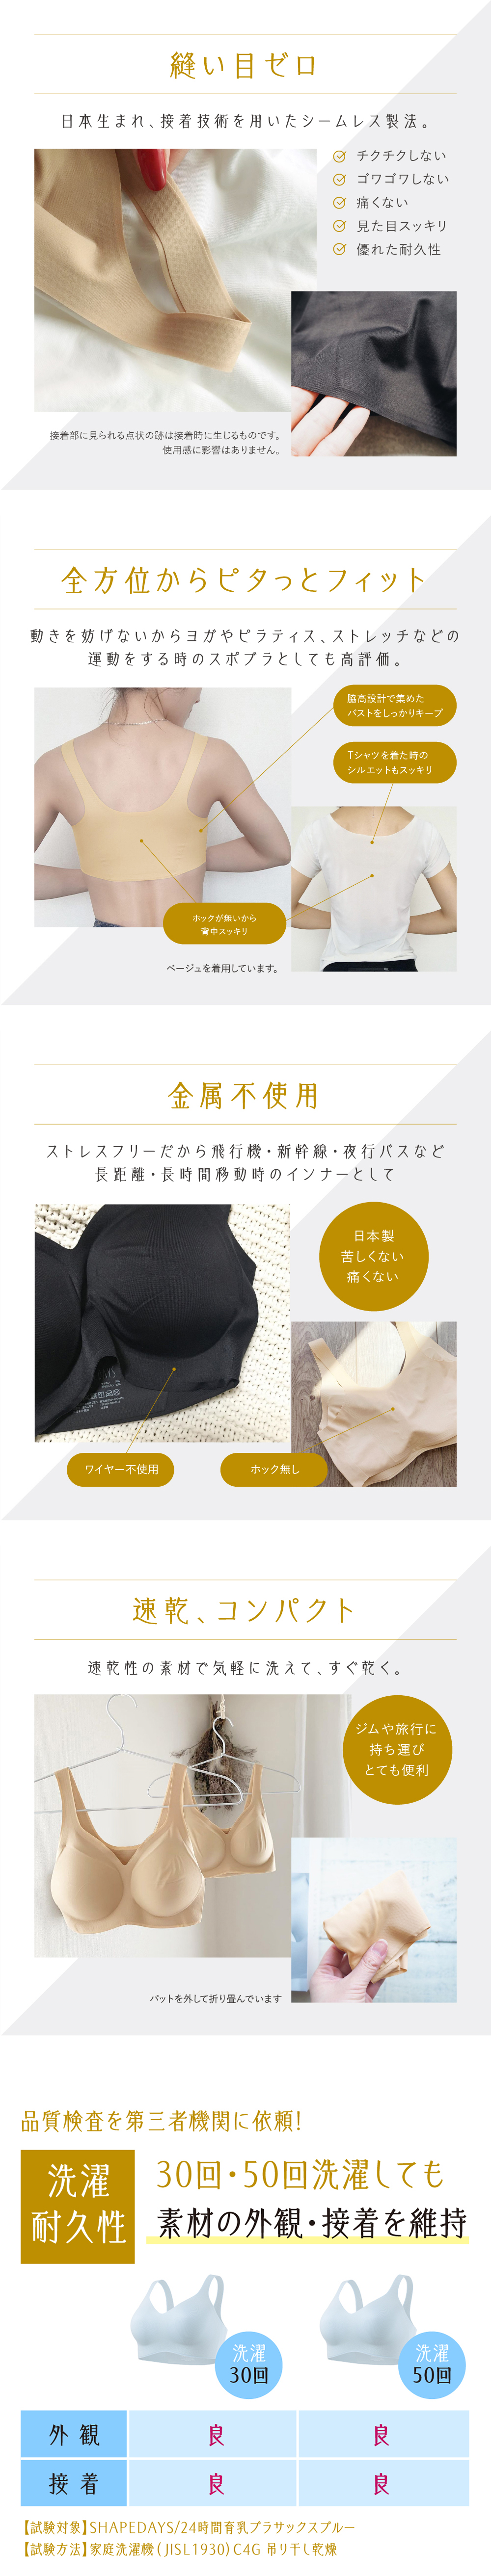 24時間育乳ブラLP商品説明04